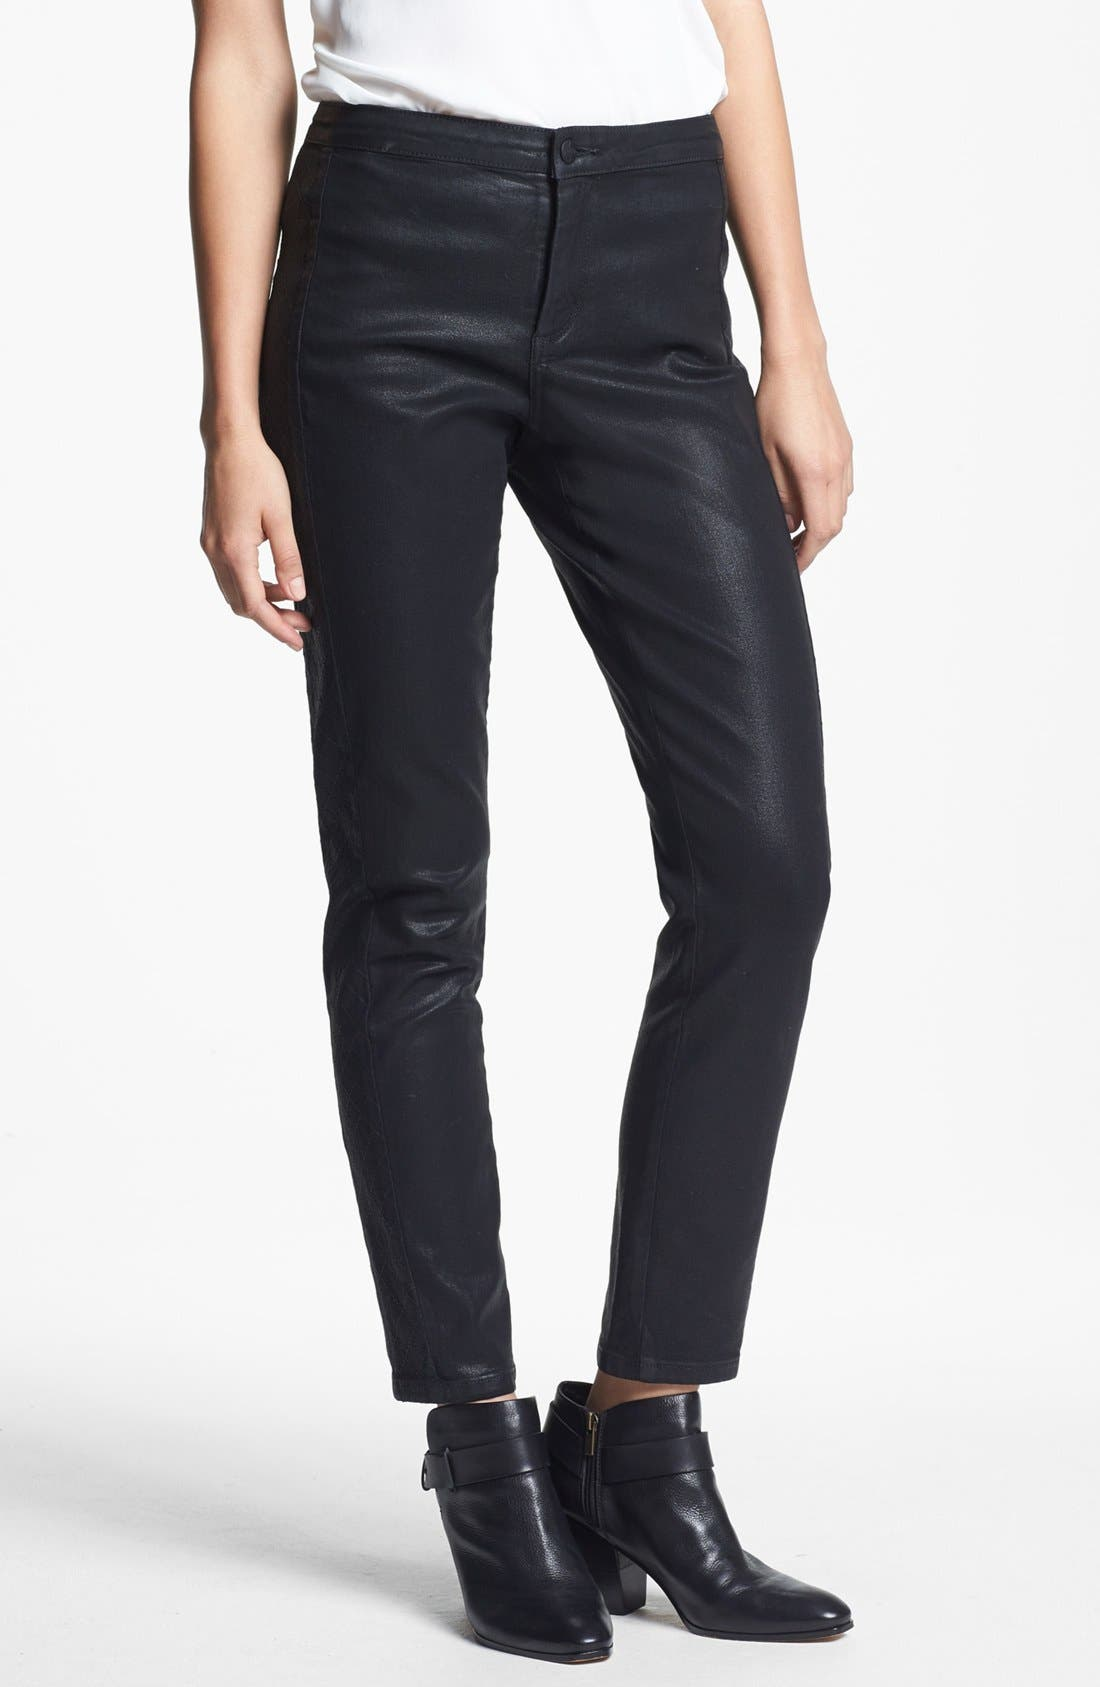 Main Image - NYDJ Coated Stretch Skinny Jeans (Black)